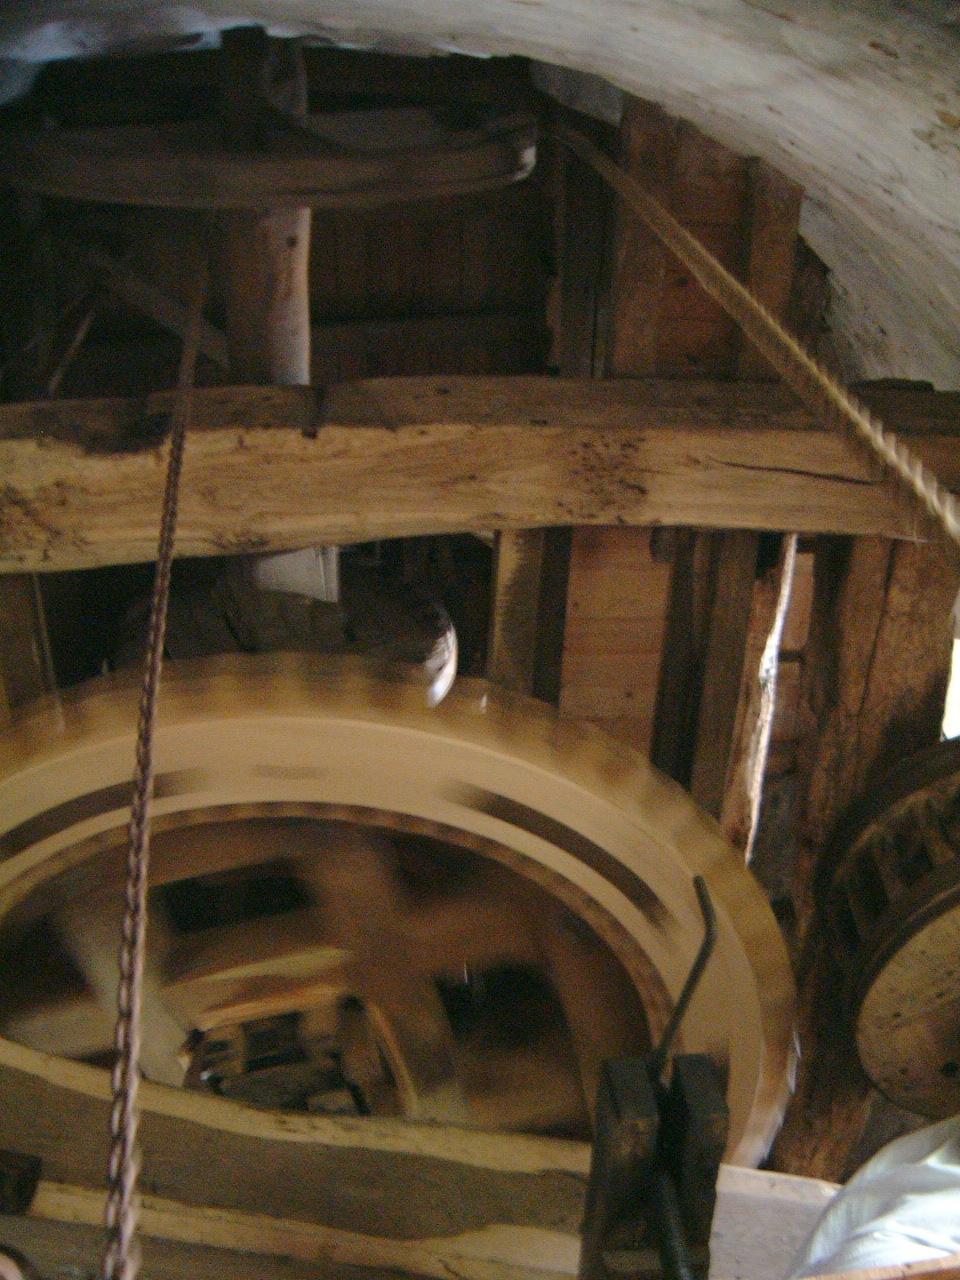 mechanics maartent gear gears mill windmill running turning speed wooden architecture interiors